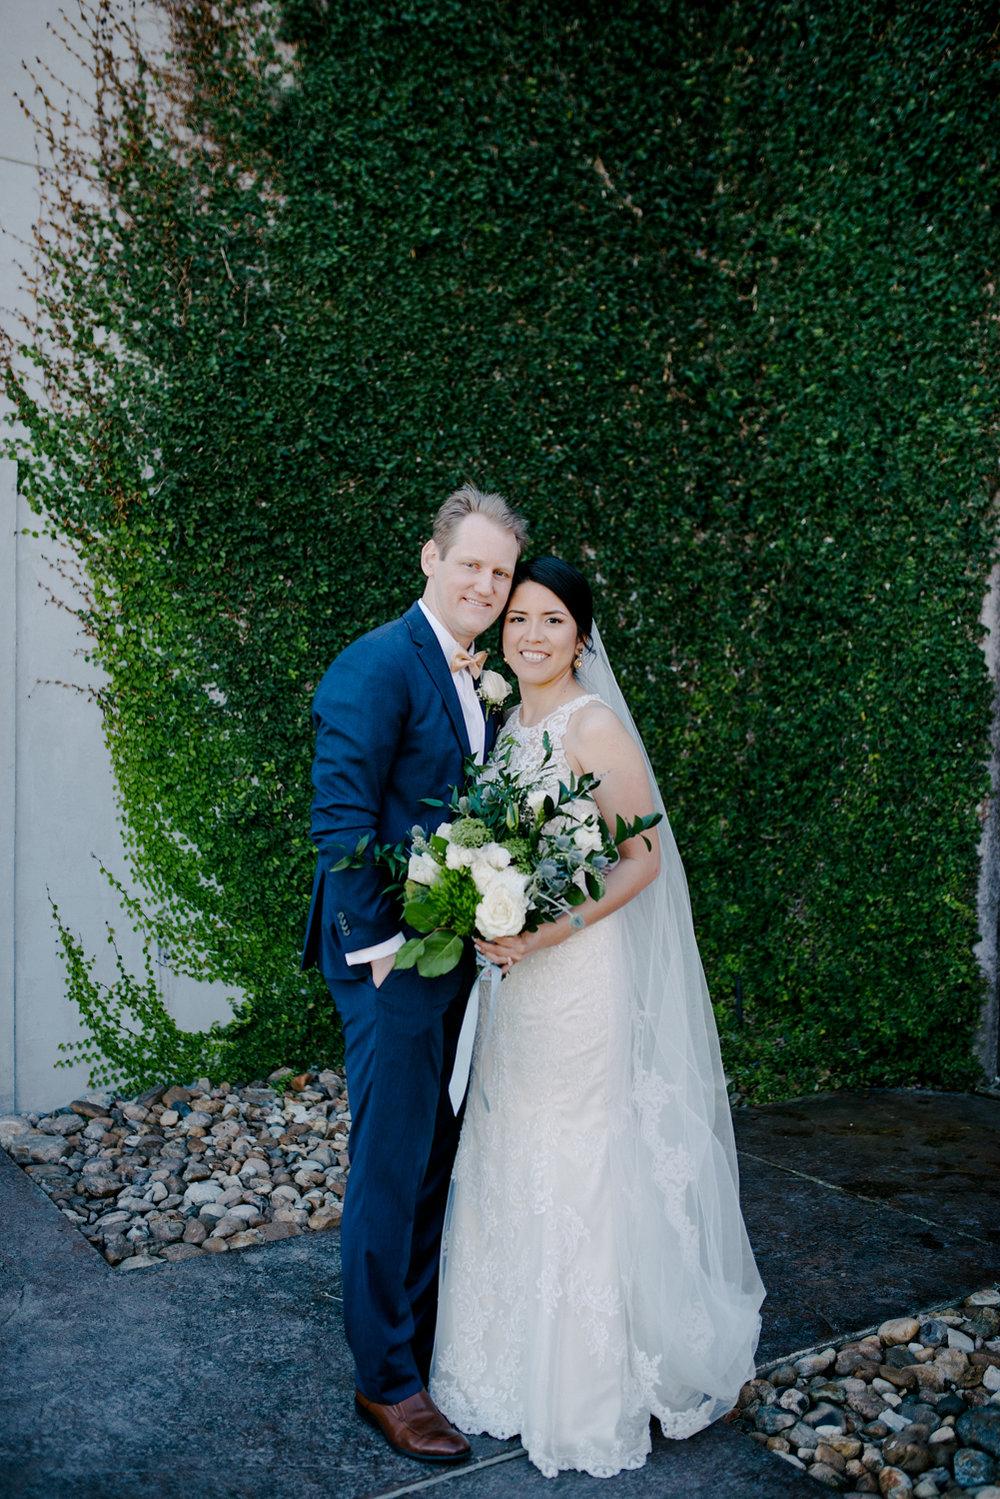 casperwedding-texasweddings-houstonweddings-oldedobbestation-montgomerytx-montgomeryweddings-bride-groom-bridalparty-weddingdress-71.jpg